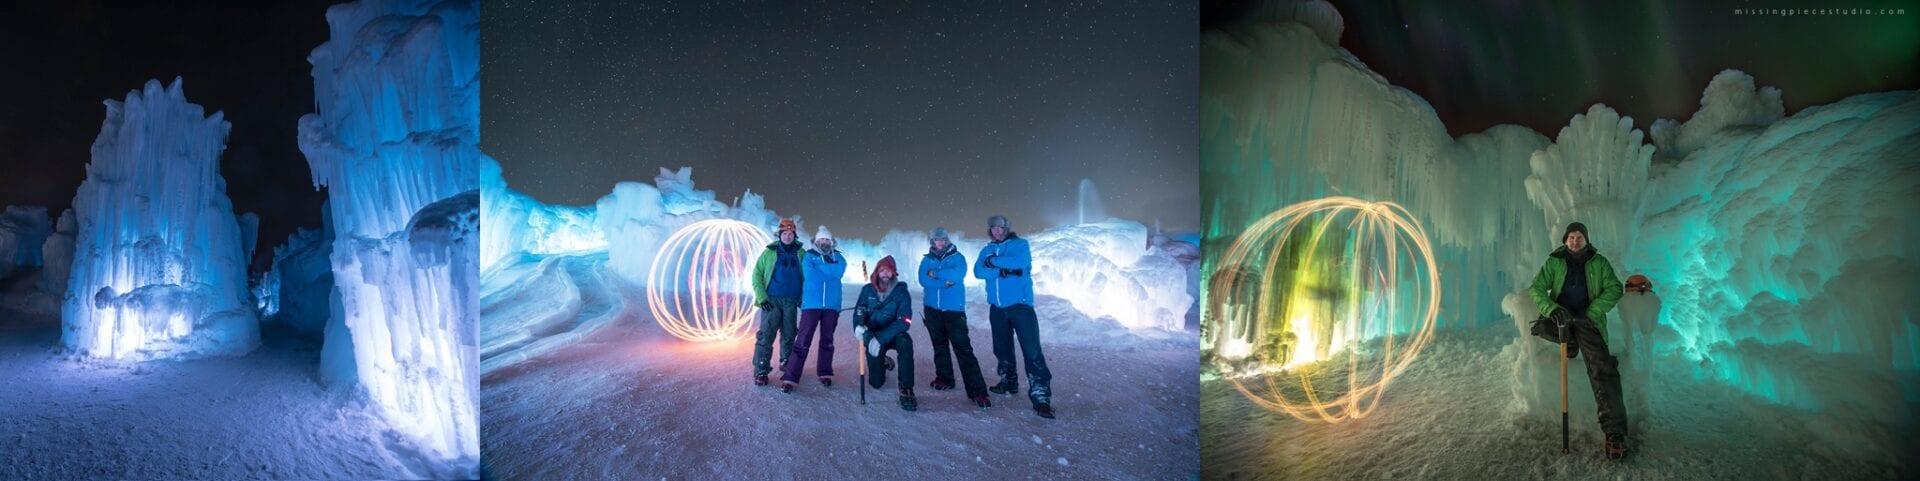 The temporary Edmonton's attraction Ice Castles at Hawrelak Park